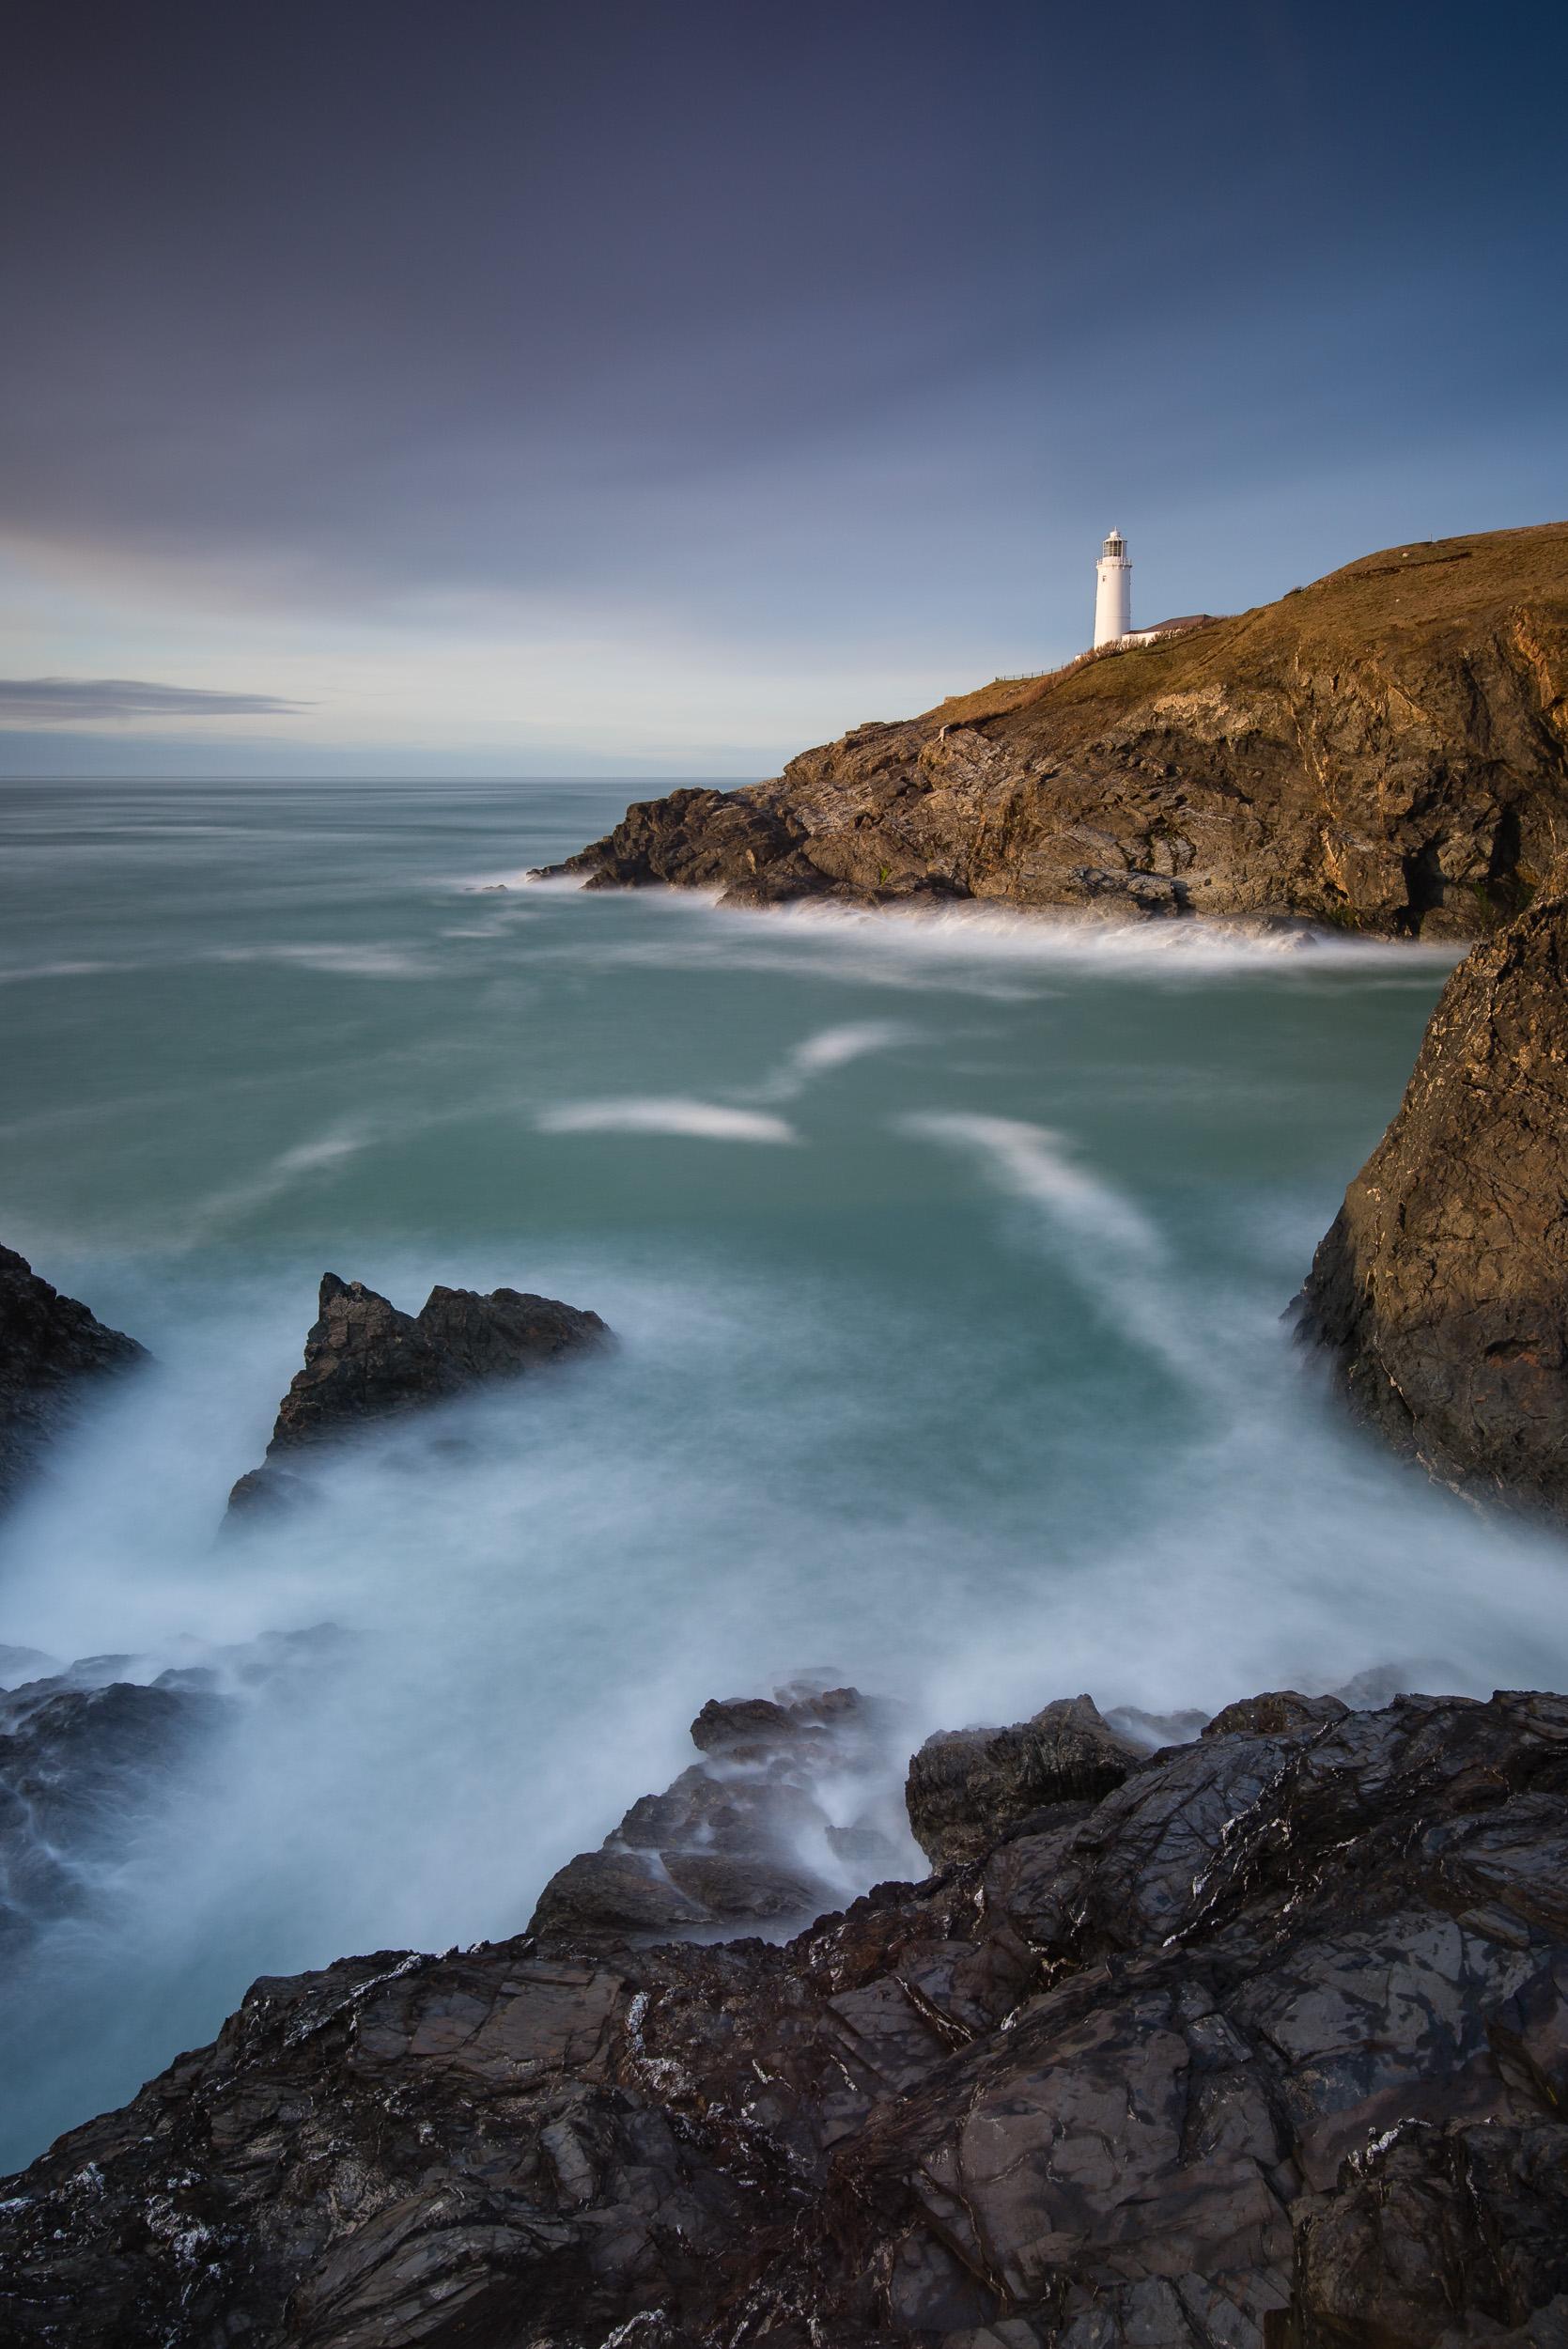 Last Light at Trevose Head, Cornwall  - Nikon D750, Nikkor 16-35mm f/4 at 22mm, f/11, 97 seconds at ISO 100.